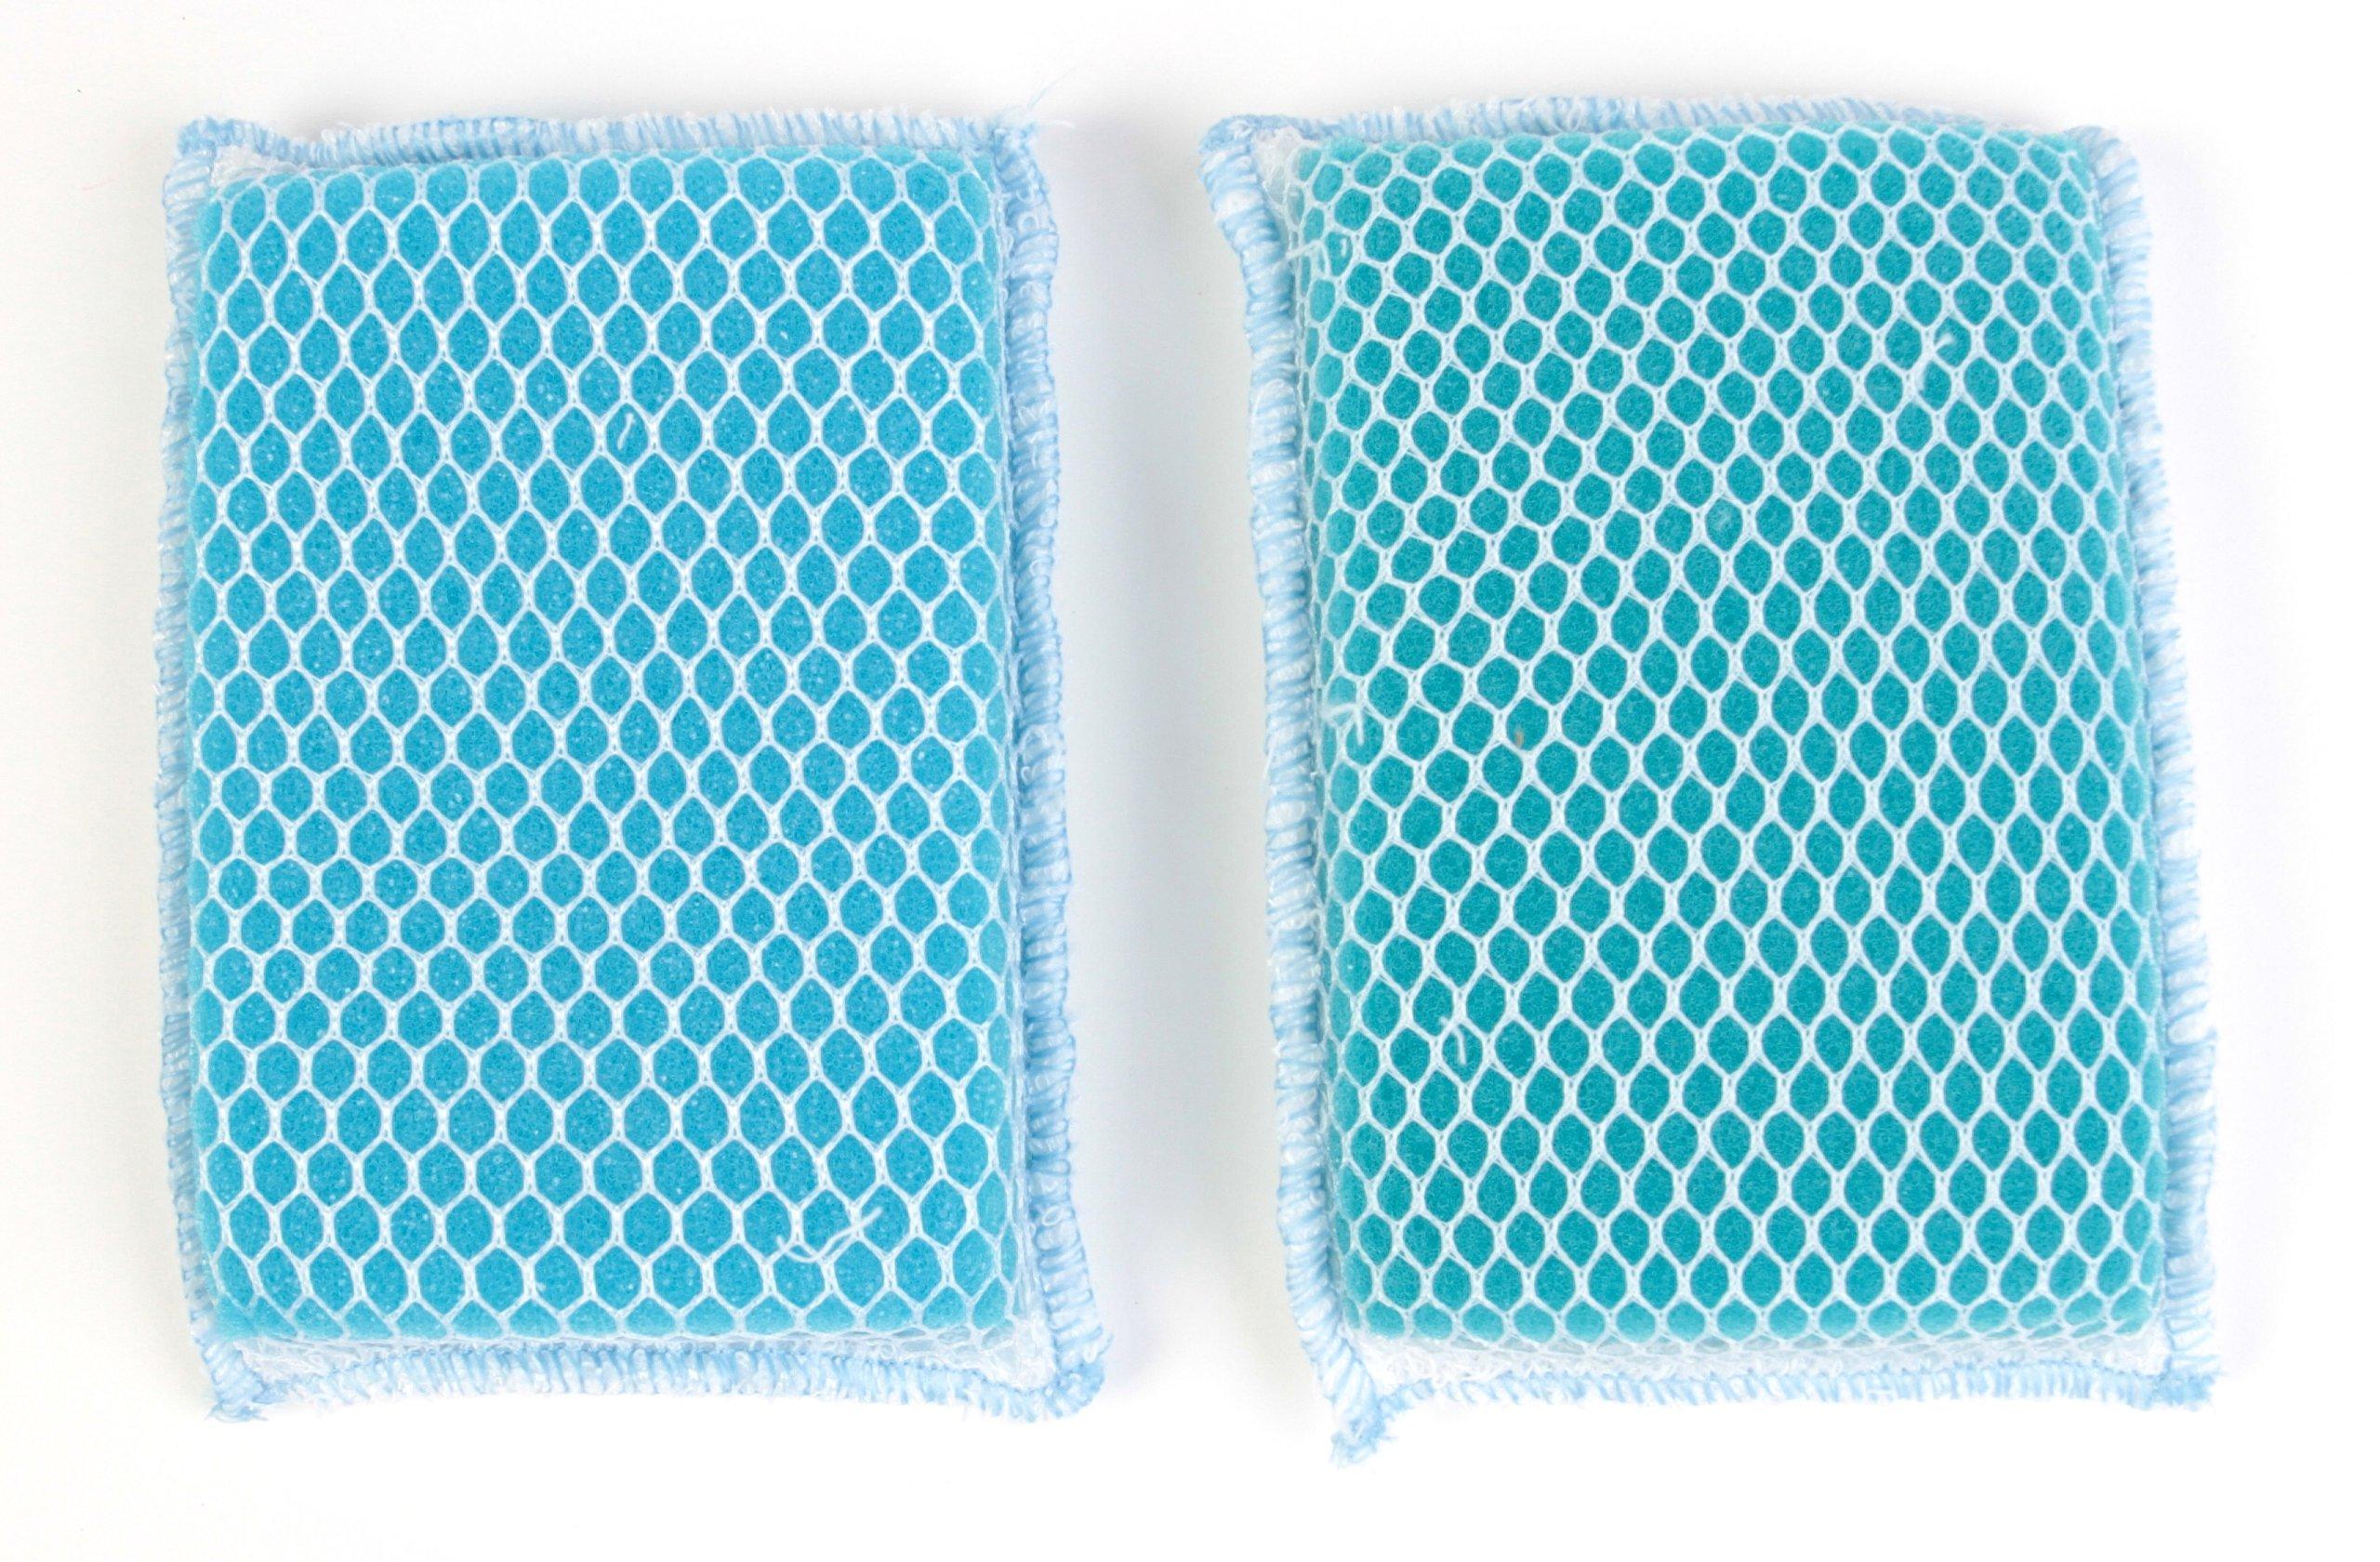 Butler Dawn Flip It Dual Sided Nylon Mesh and Cloth Kitchen Sponge, 48-pack (96 Sponges)